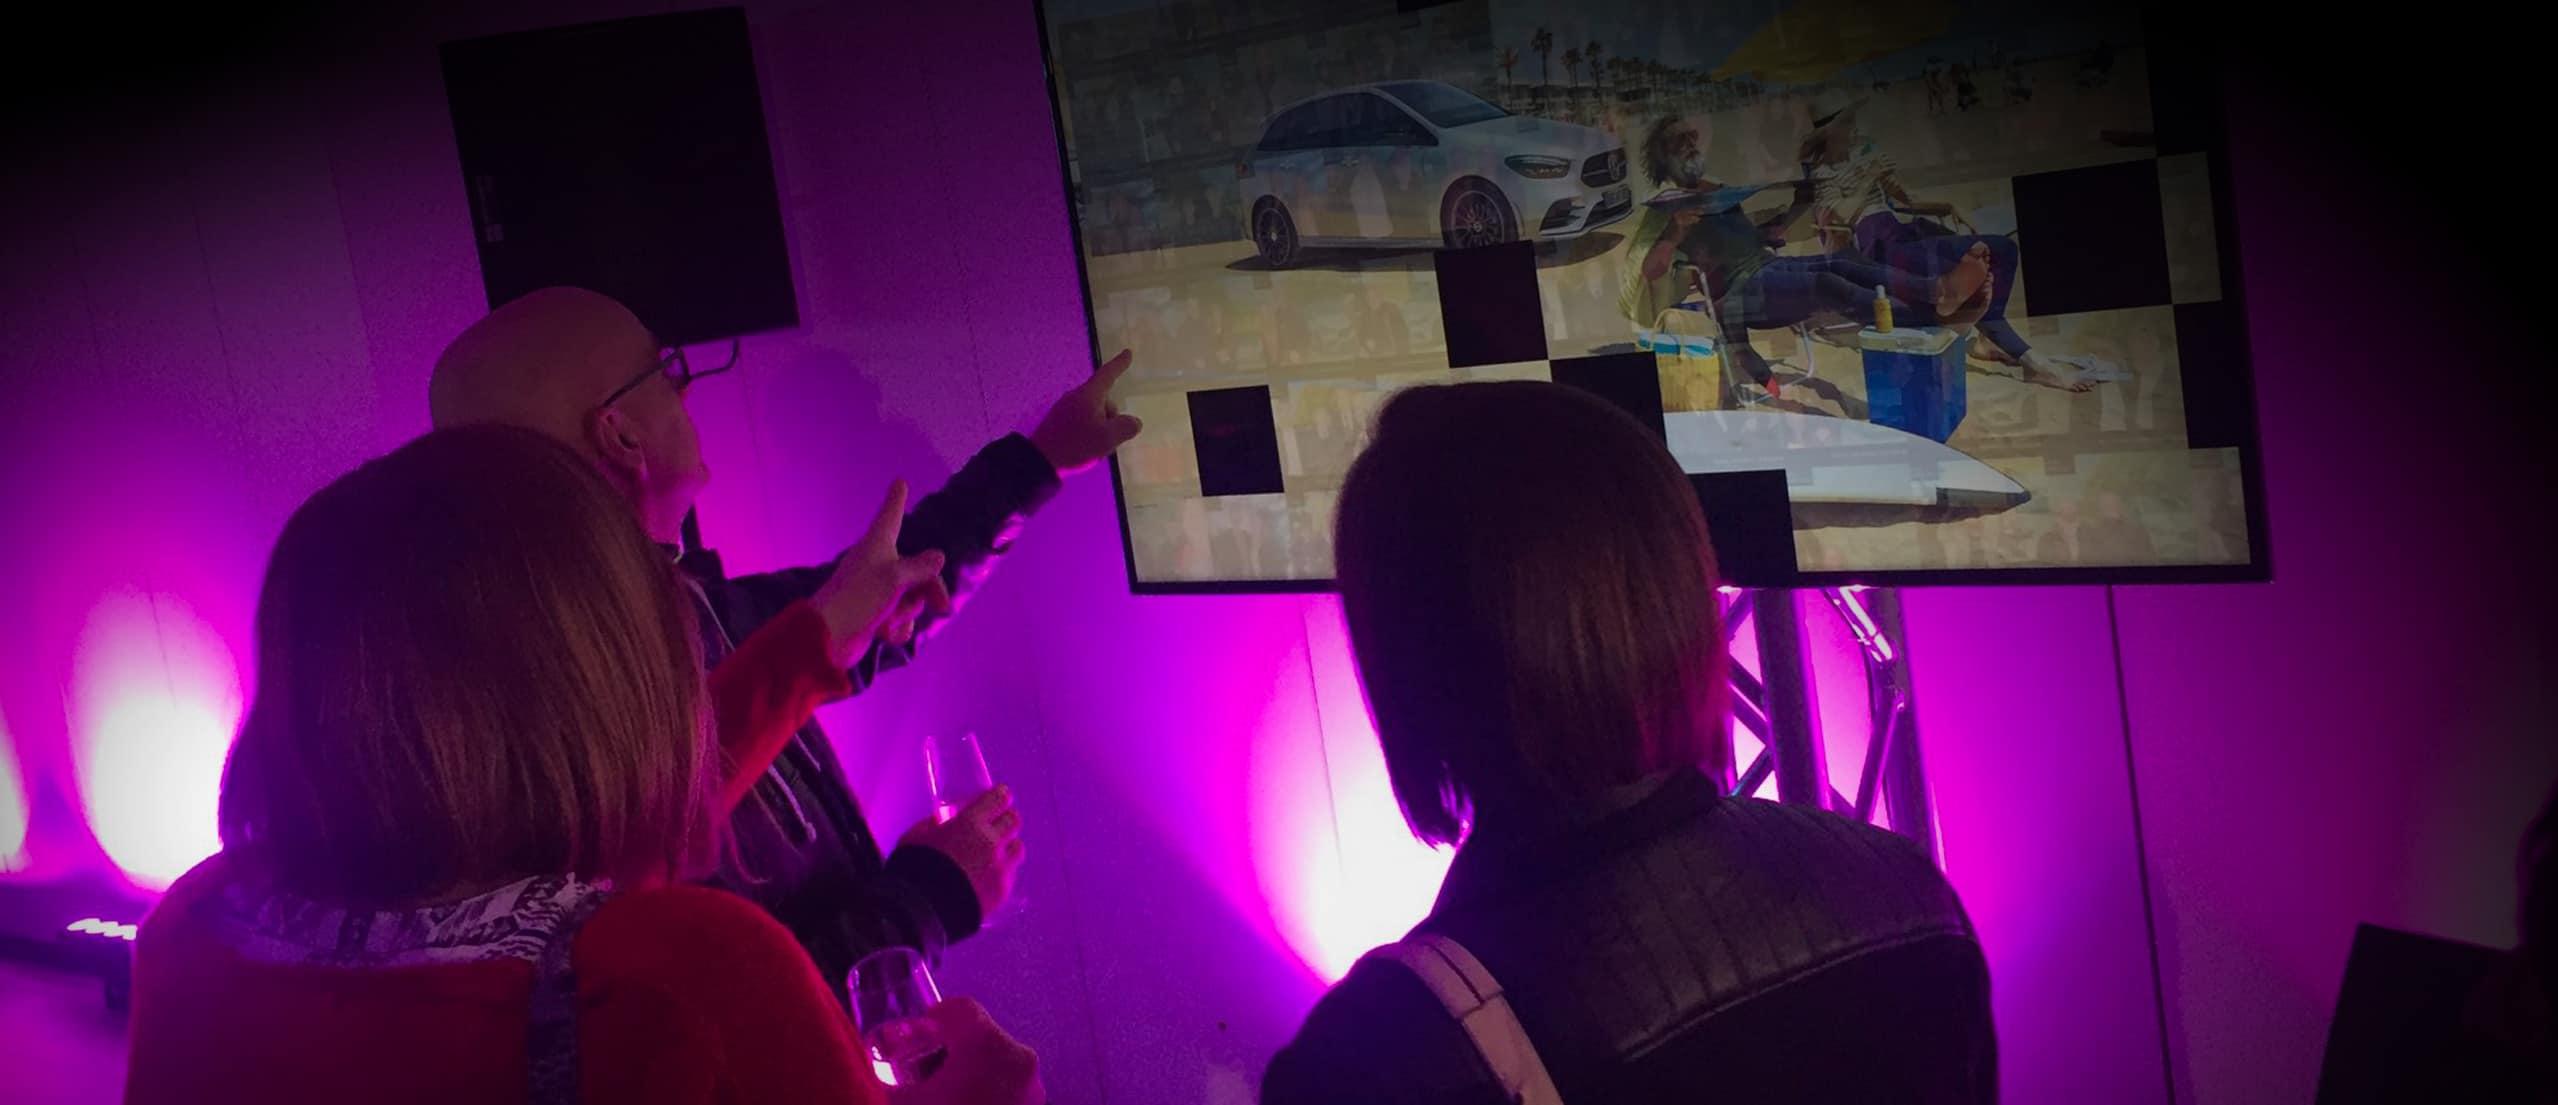 Animation mosaique live Photobooth